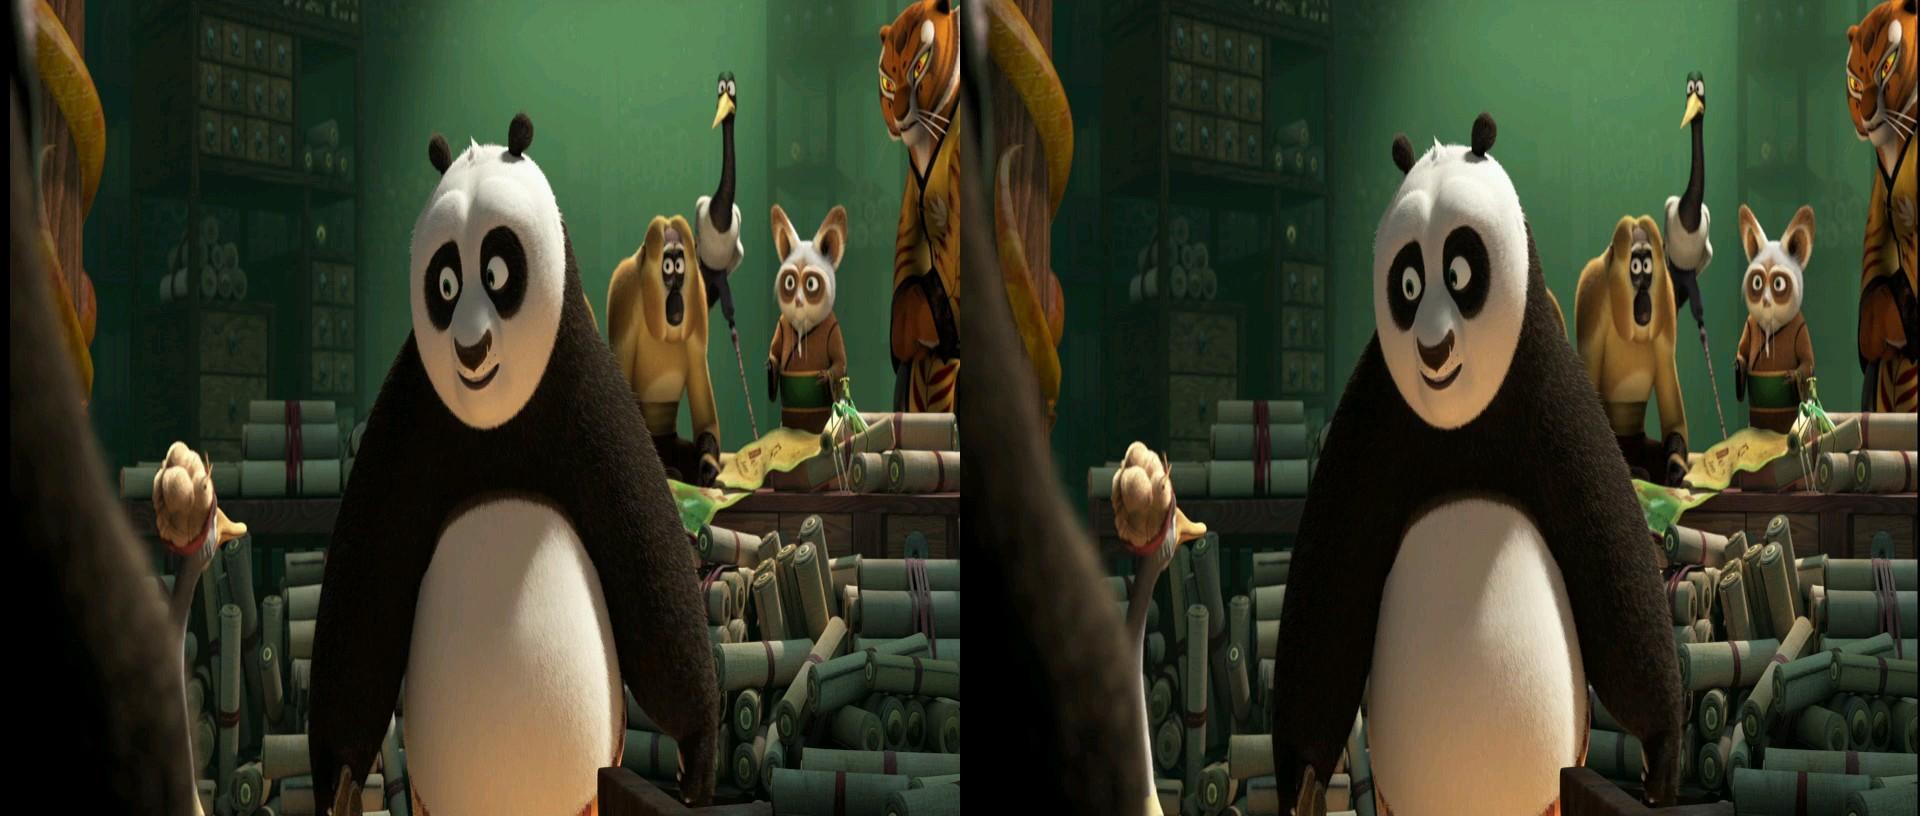 Kung Fu Panda 3 3D   2016   3D H-SBS 1080p BluRay   DuaL TR-EN - Teklink indir